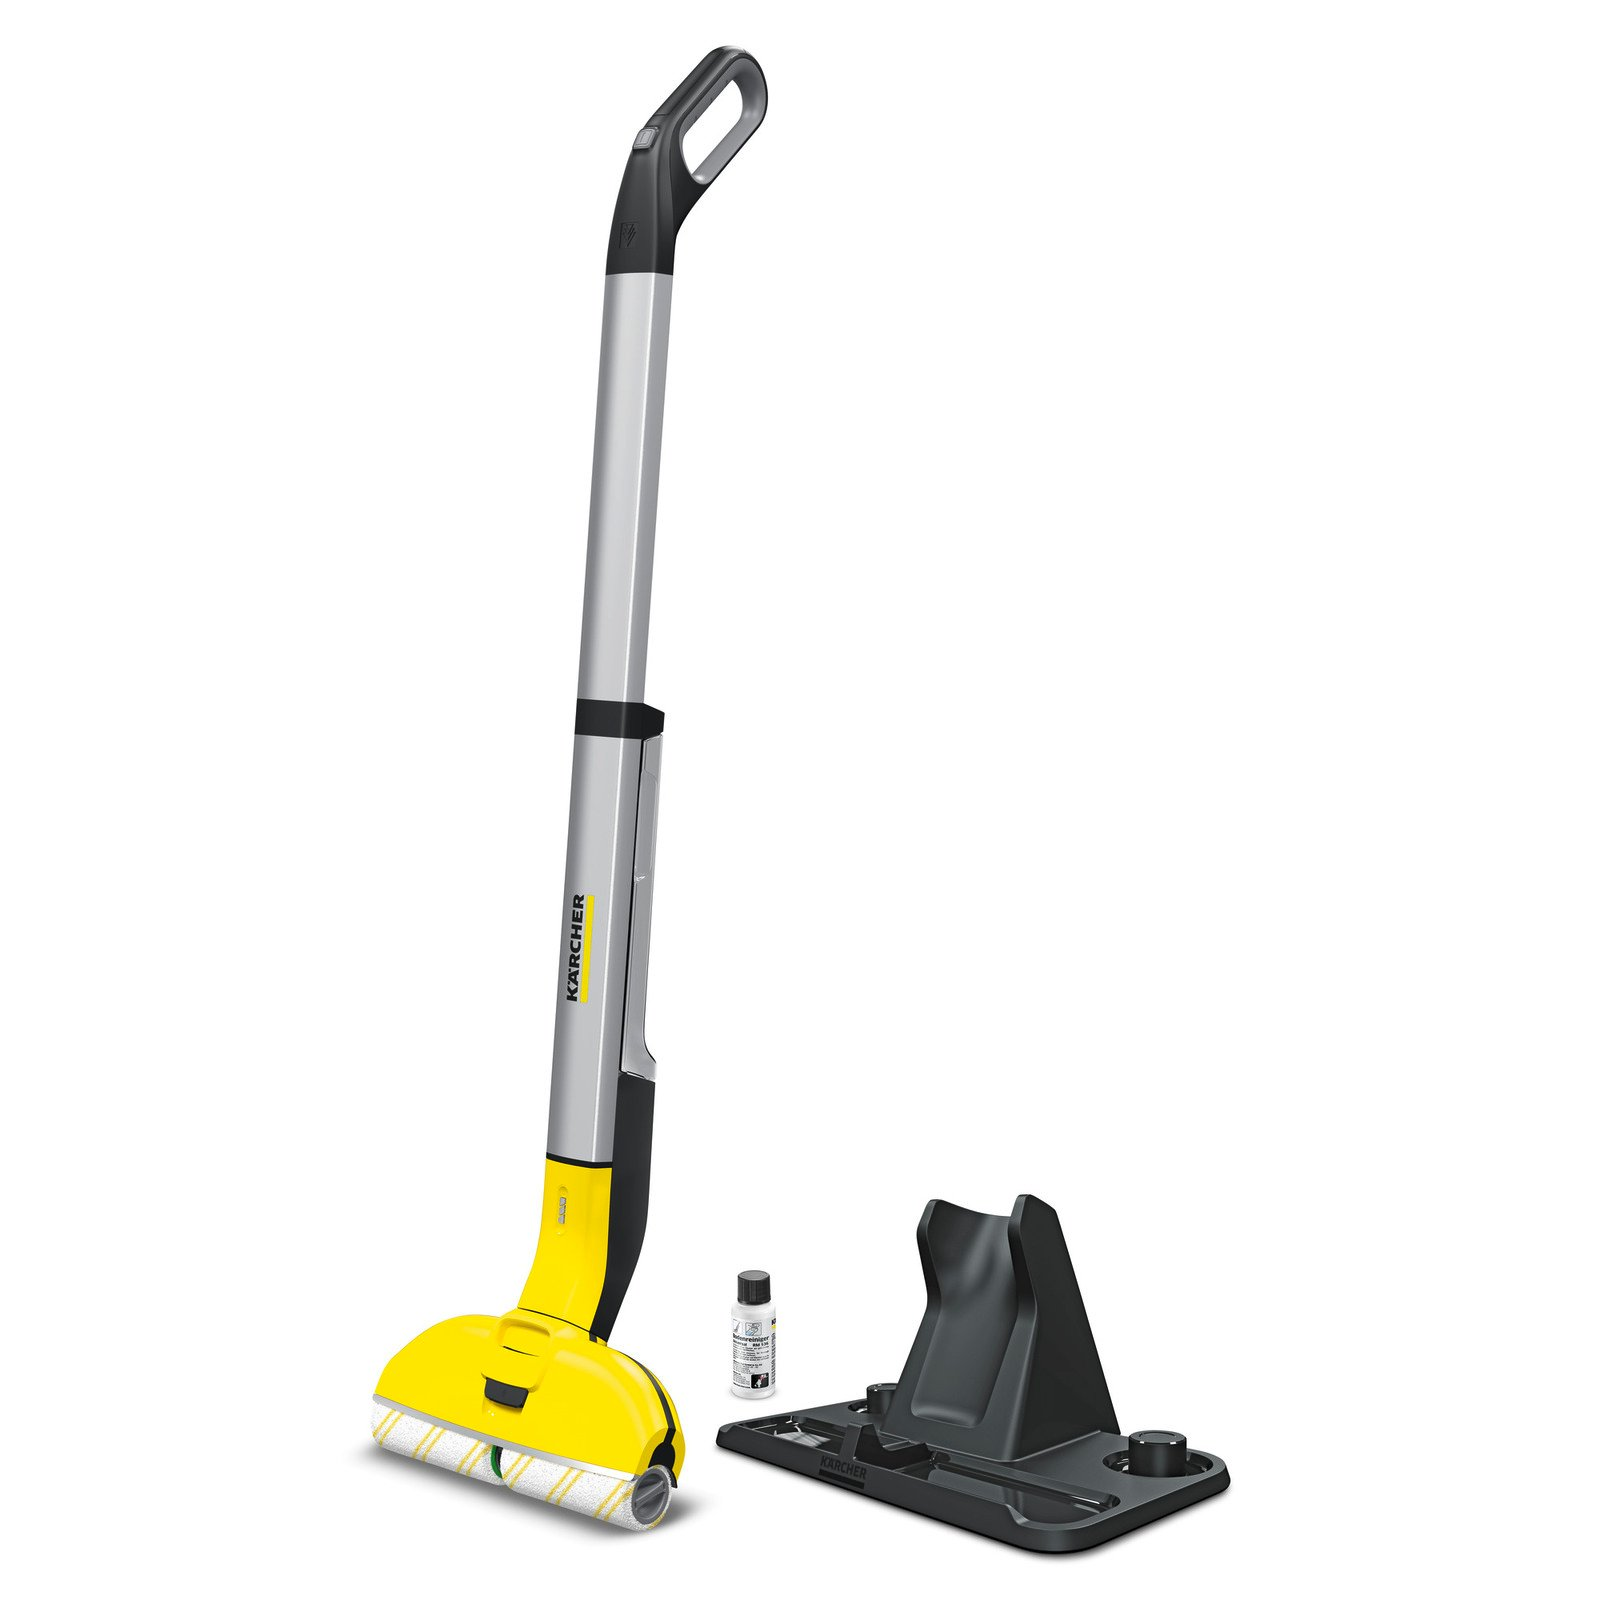 Kärcher - FC 3 Cordless Floor Cleaner